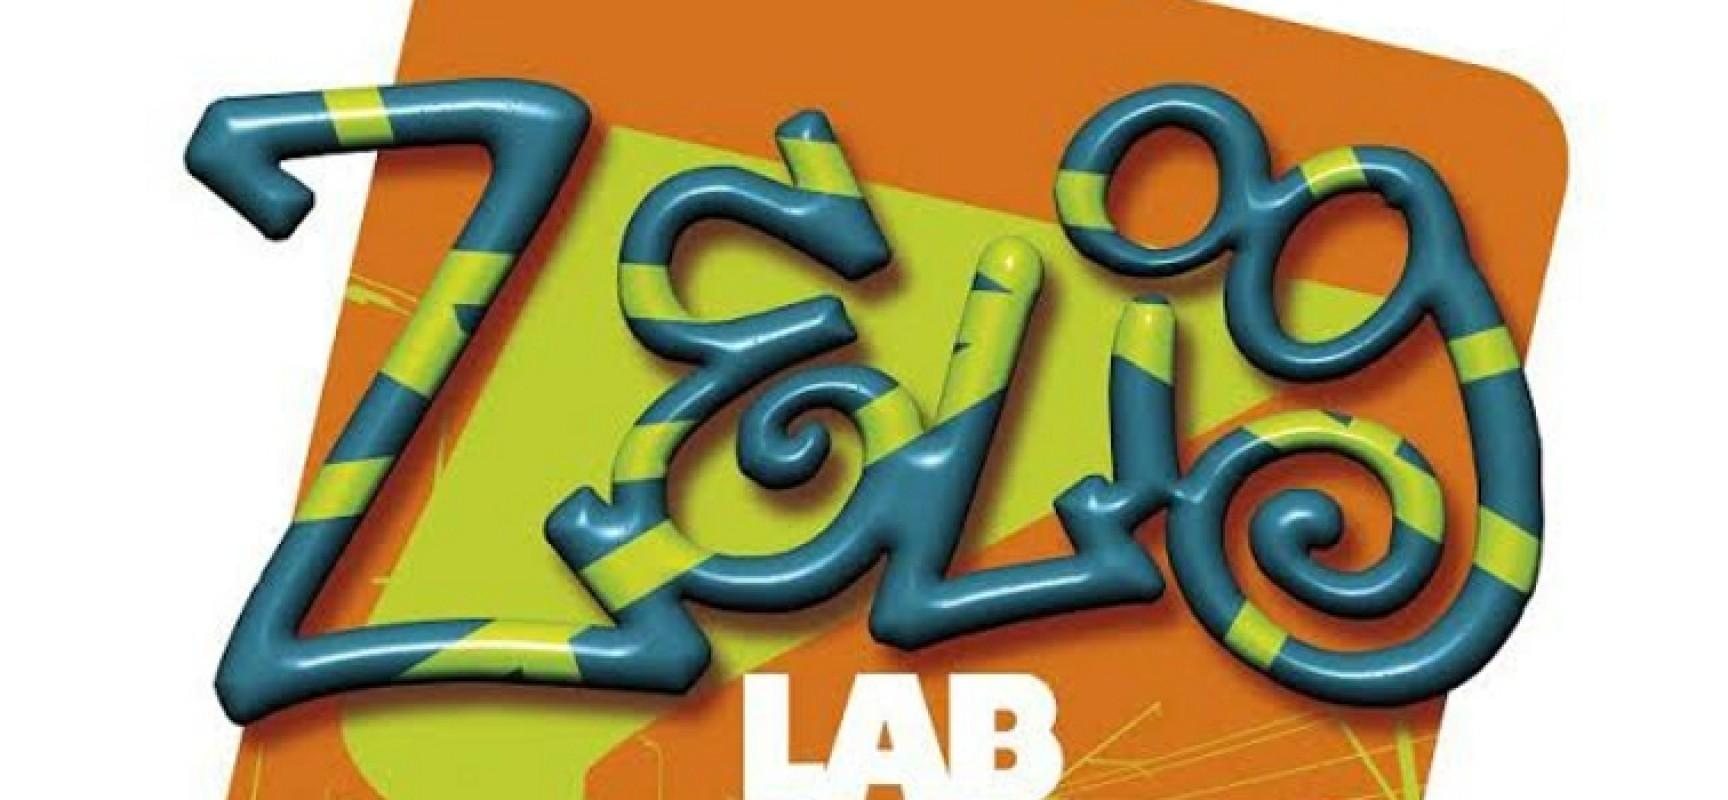 Zelig Lab a Bisceglie, venerdì 29 il primo appuntamento all'Open Source